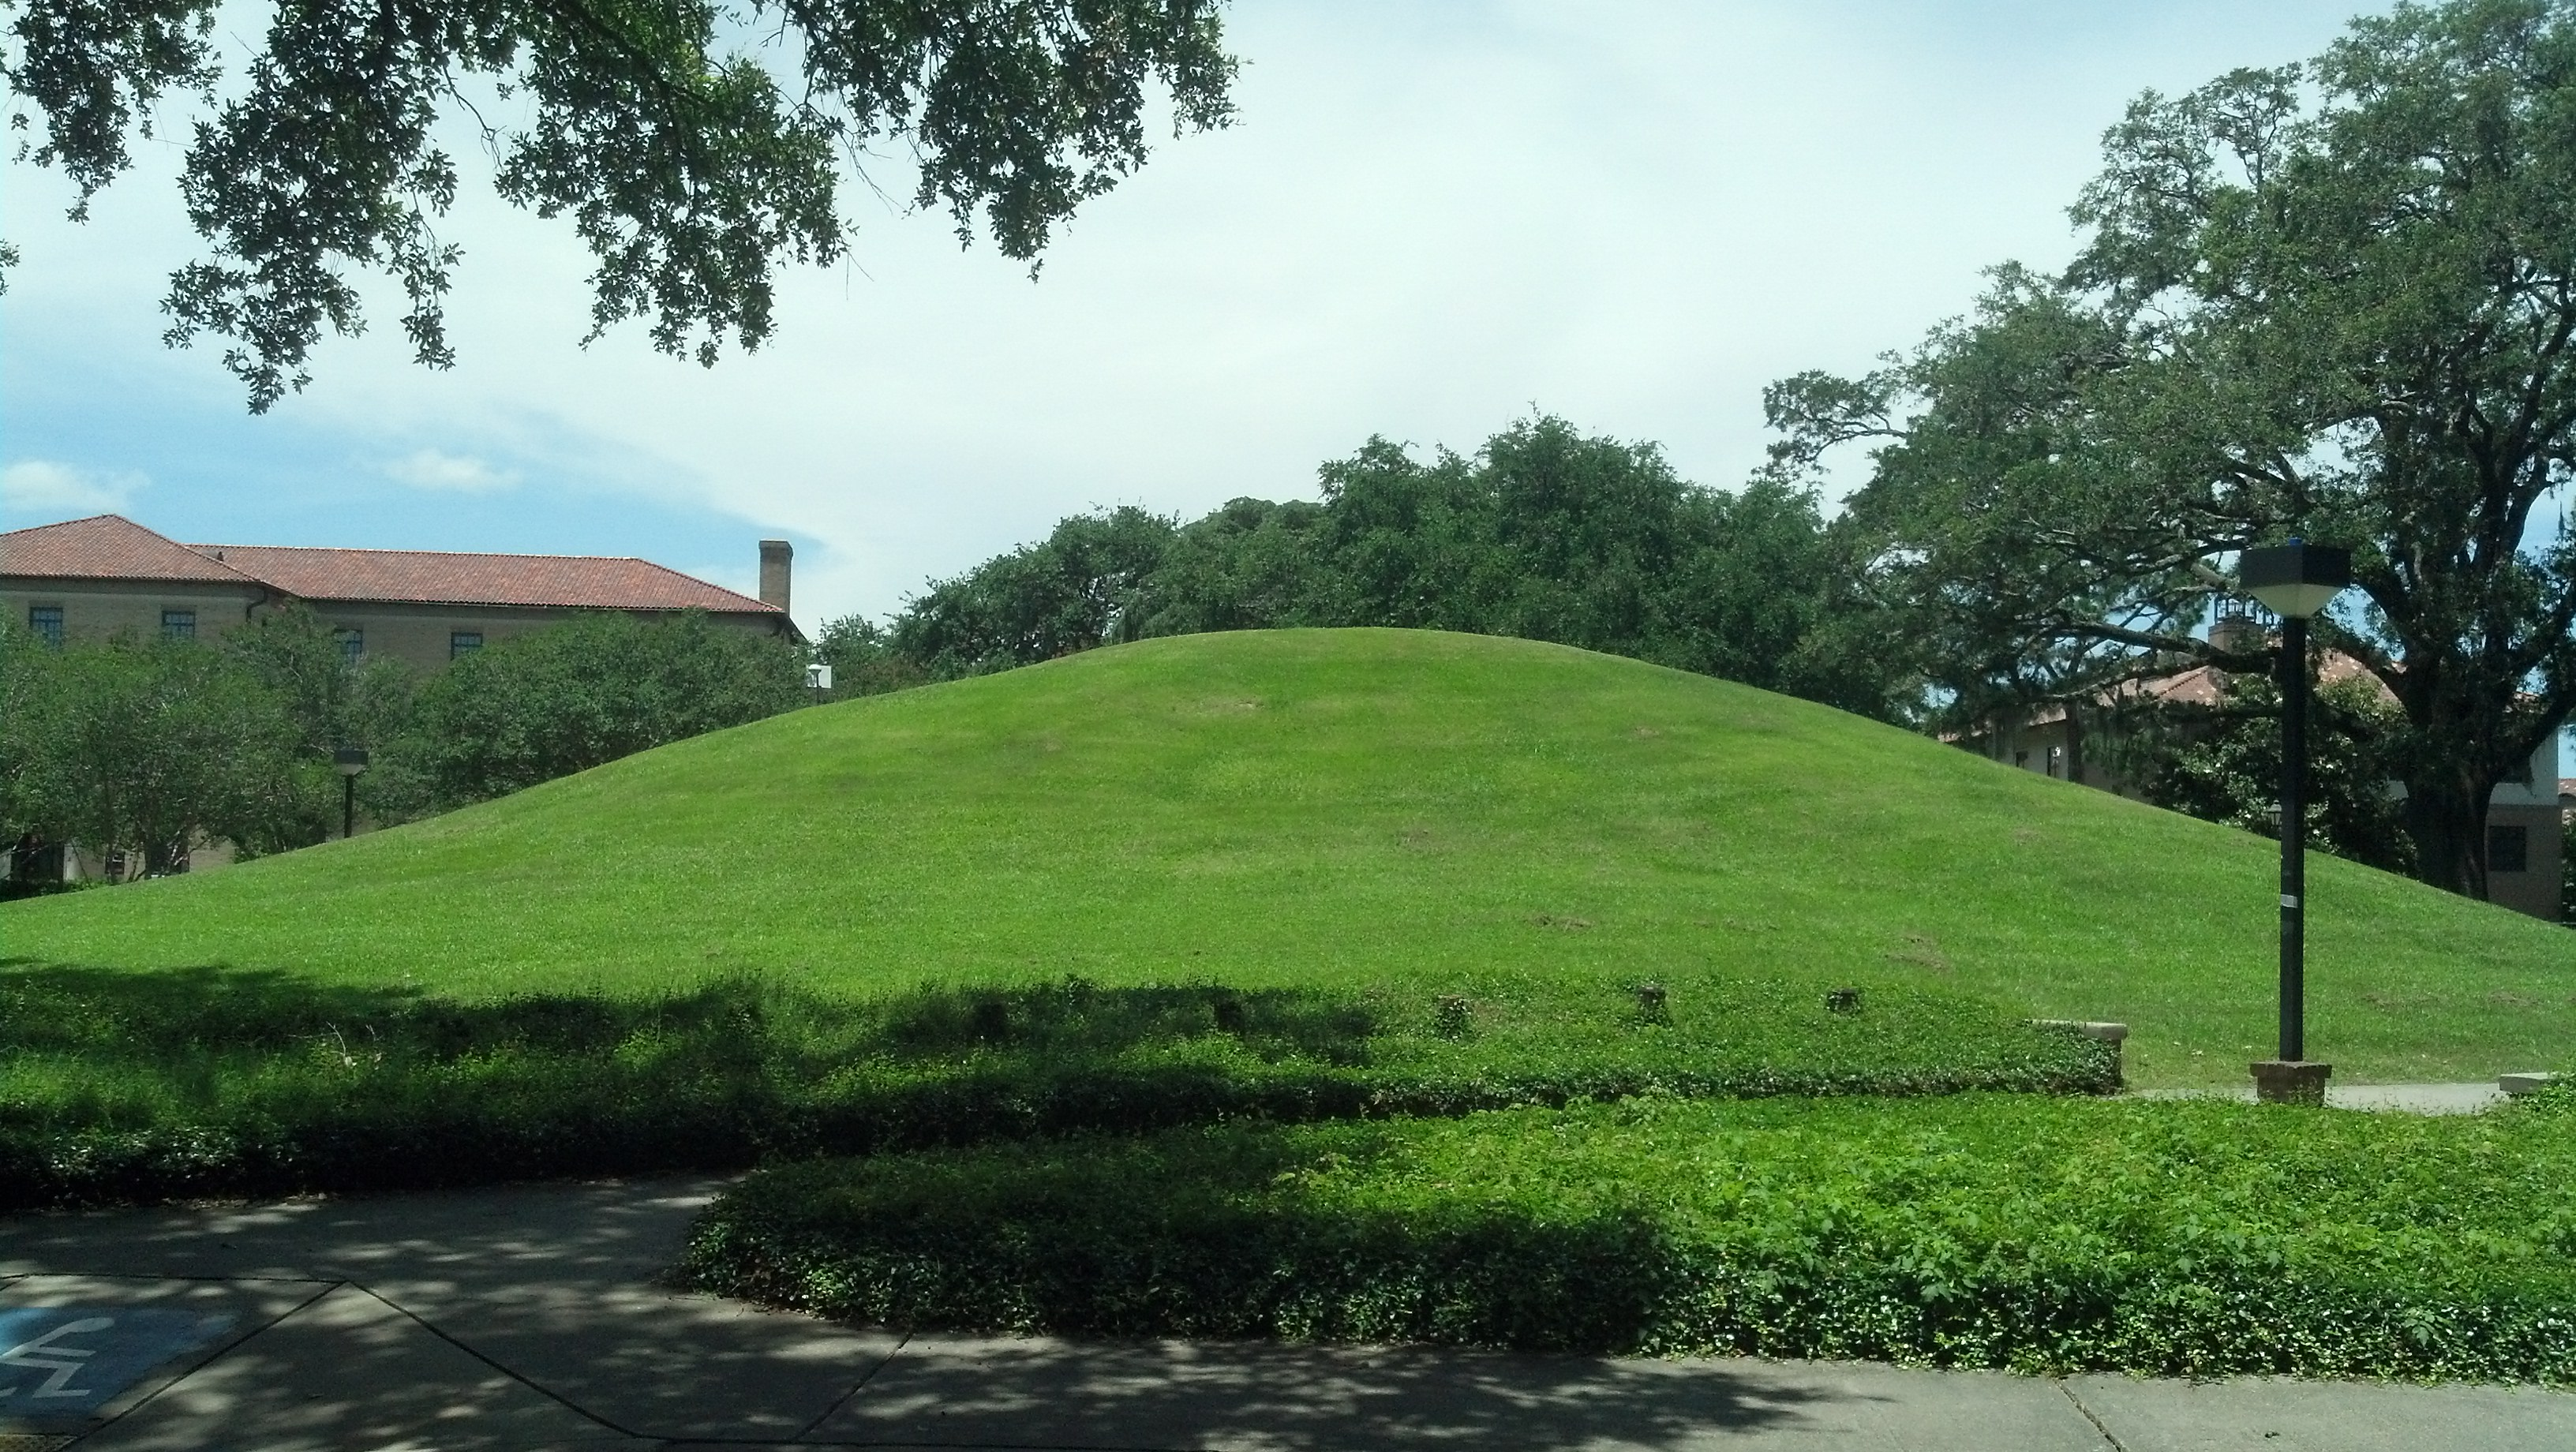 mound bayou hindu single men 4,000 years of african american history in one post between the years 1500 and 1820 more than 125 million african men and mound bayou mississippi.